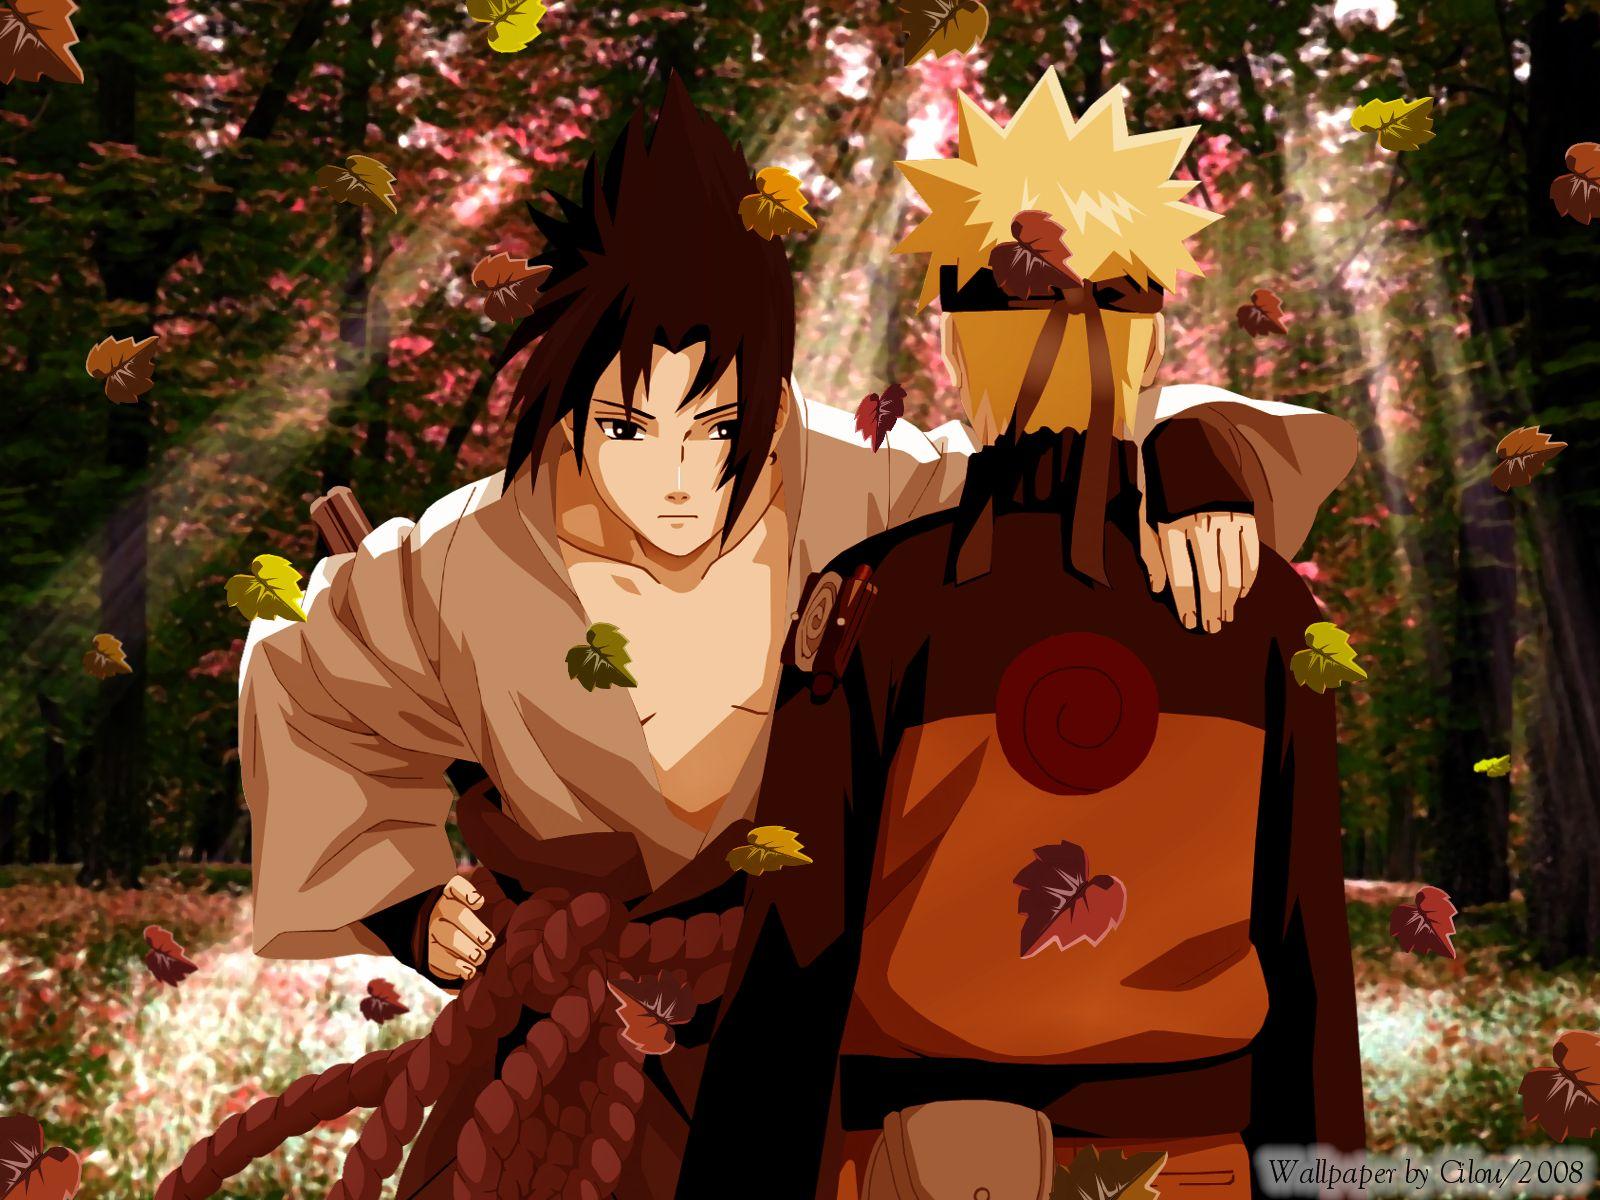 Wallpapers Naruto Shippuden 1600x1200